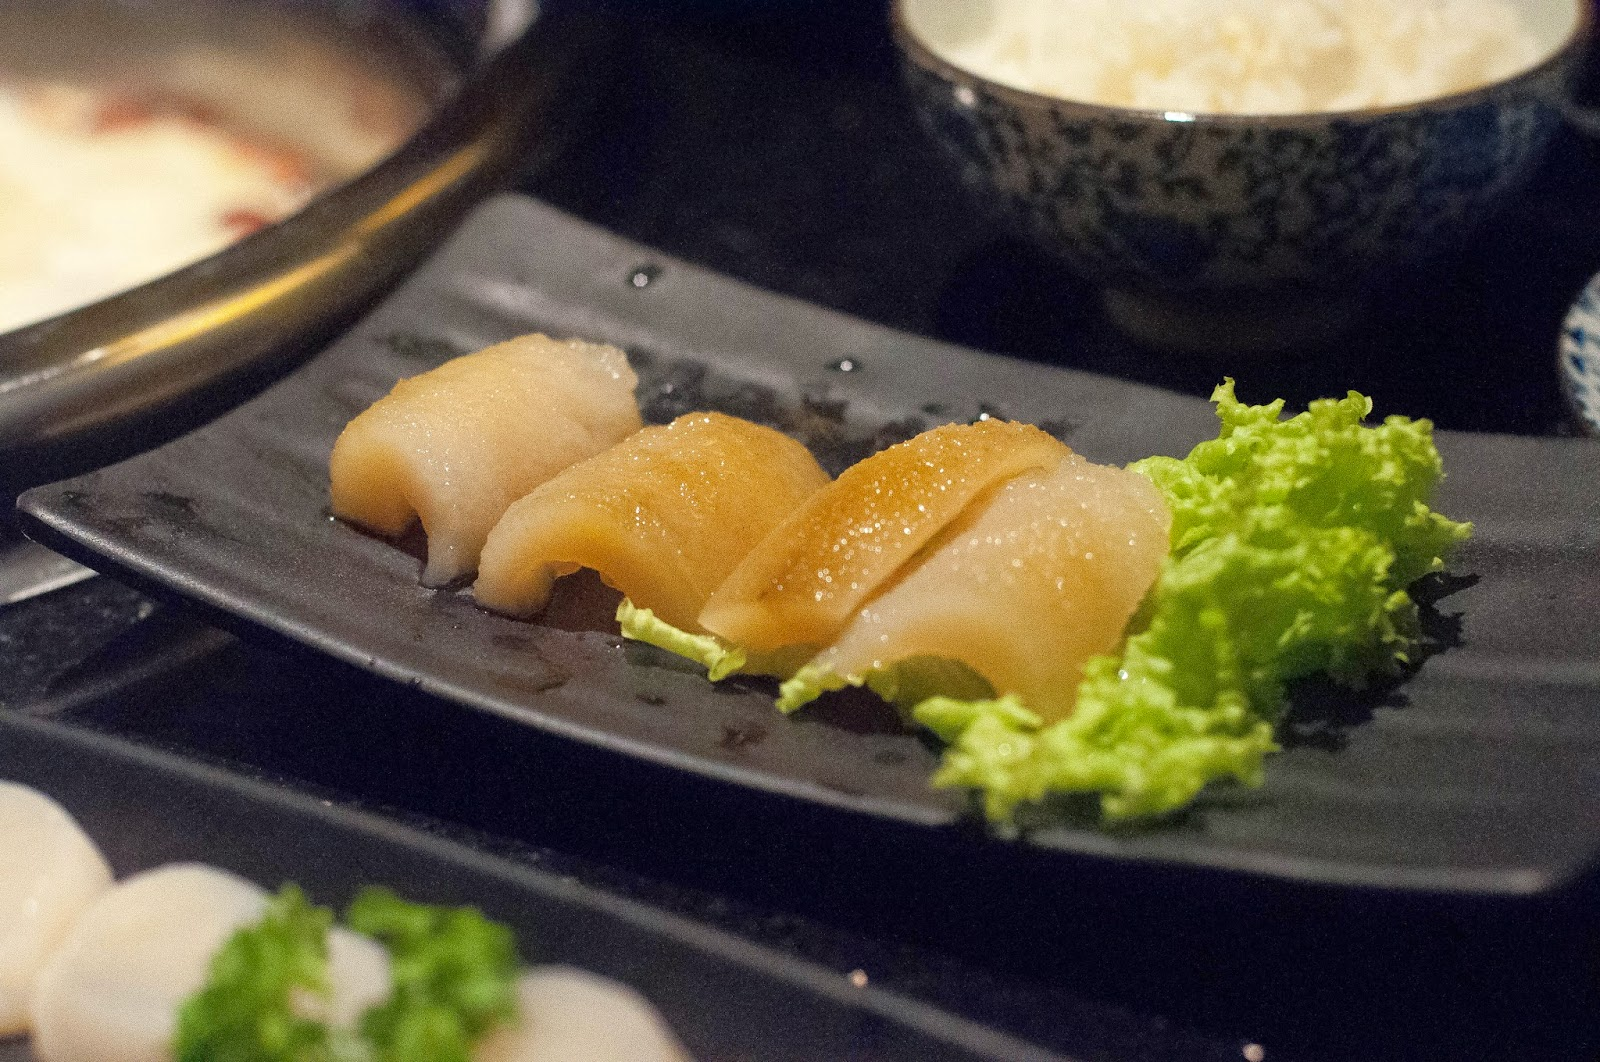 Sea cucumber benefits